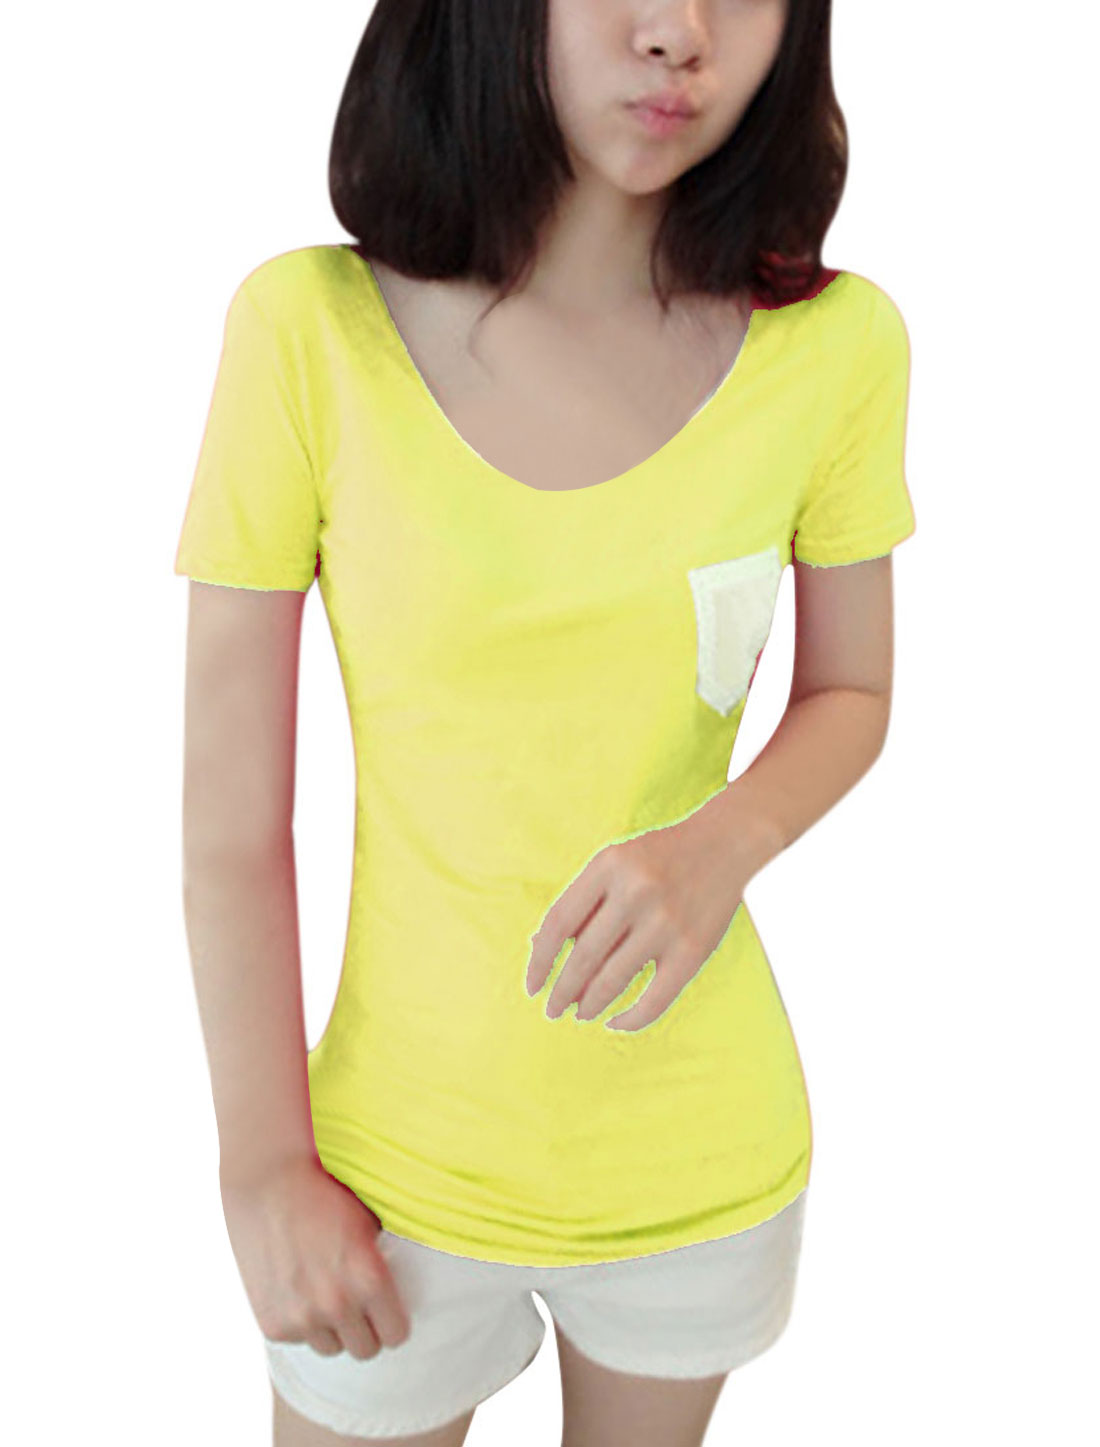 Lady Yellow Panel Crochet Chest Pocket Summer Tee Shirt XS